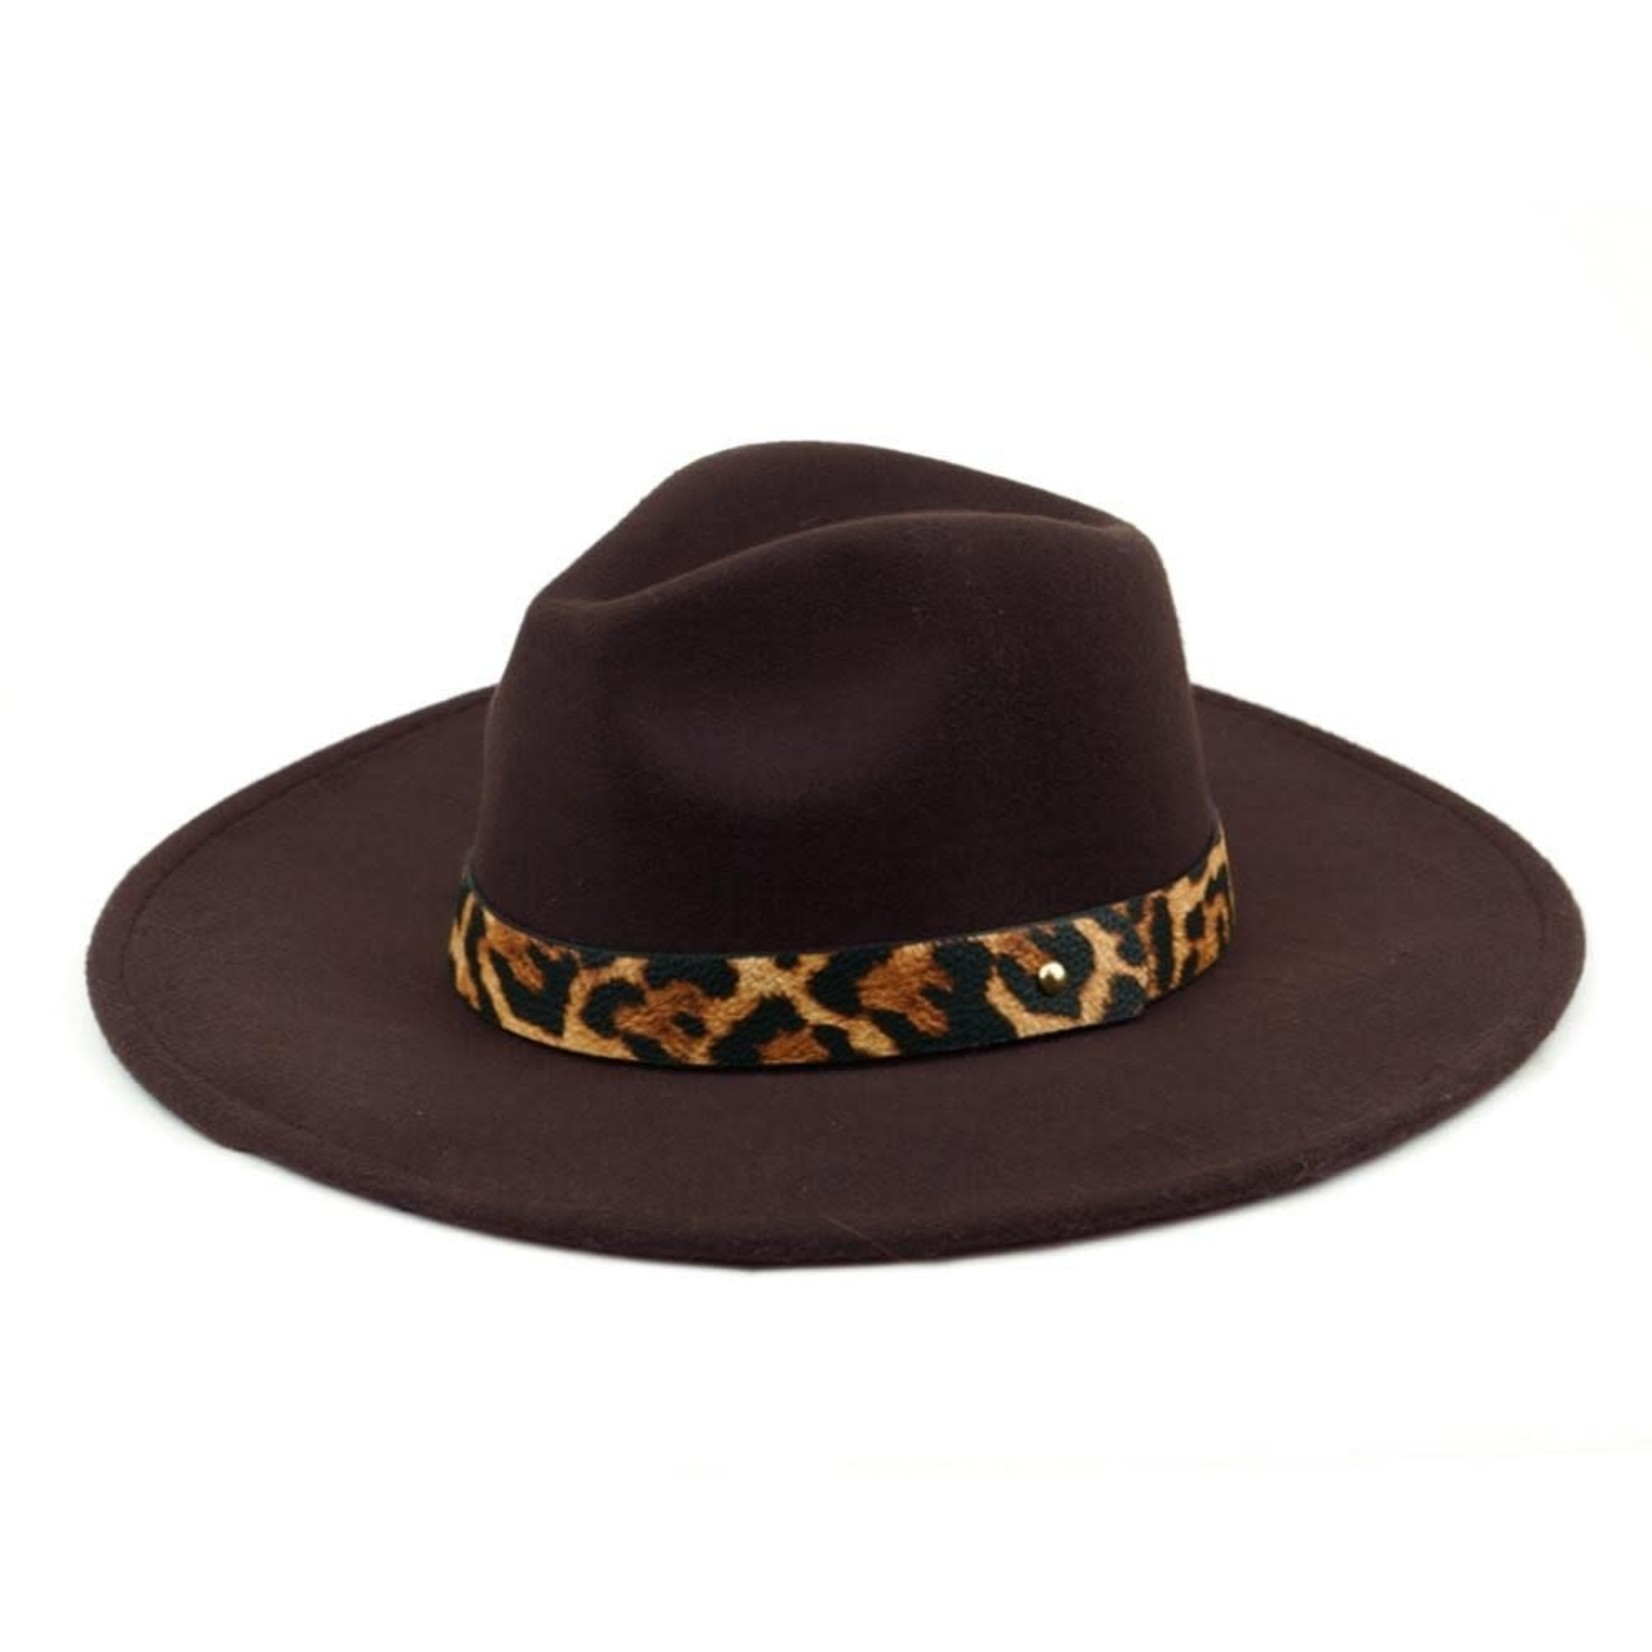 Wool Felt Panama Hat  Brown